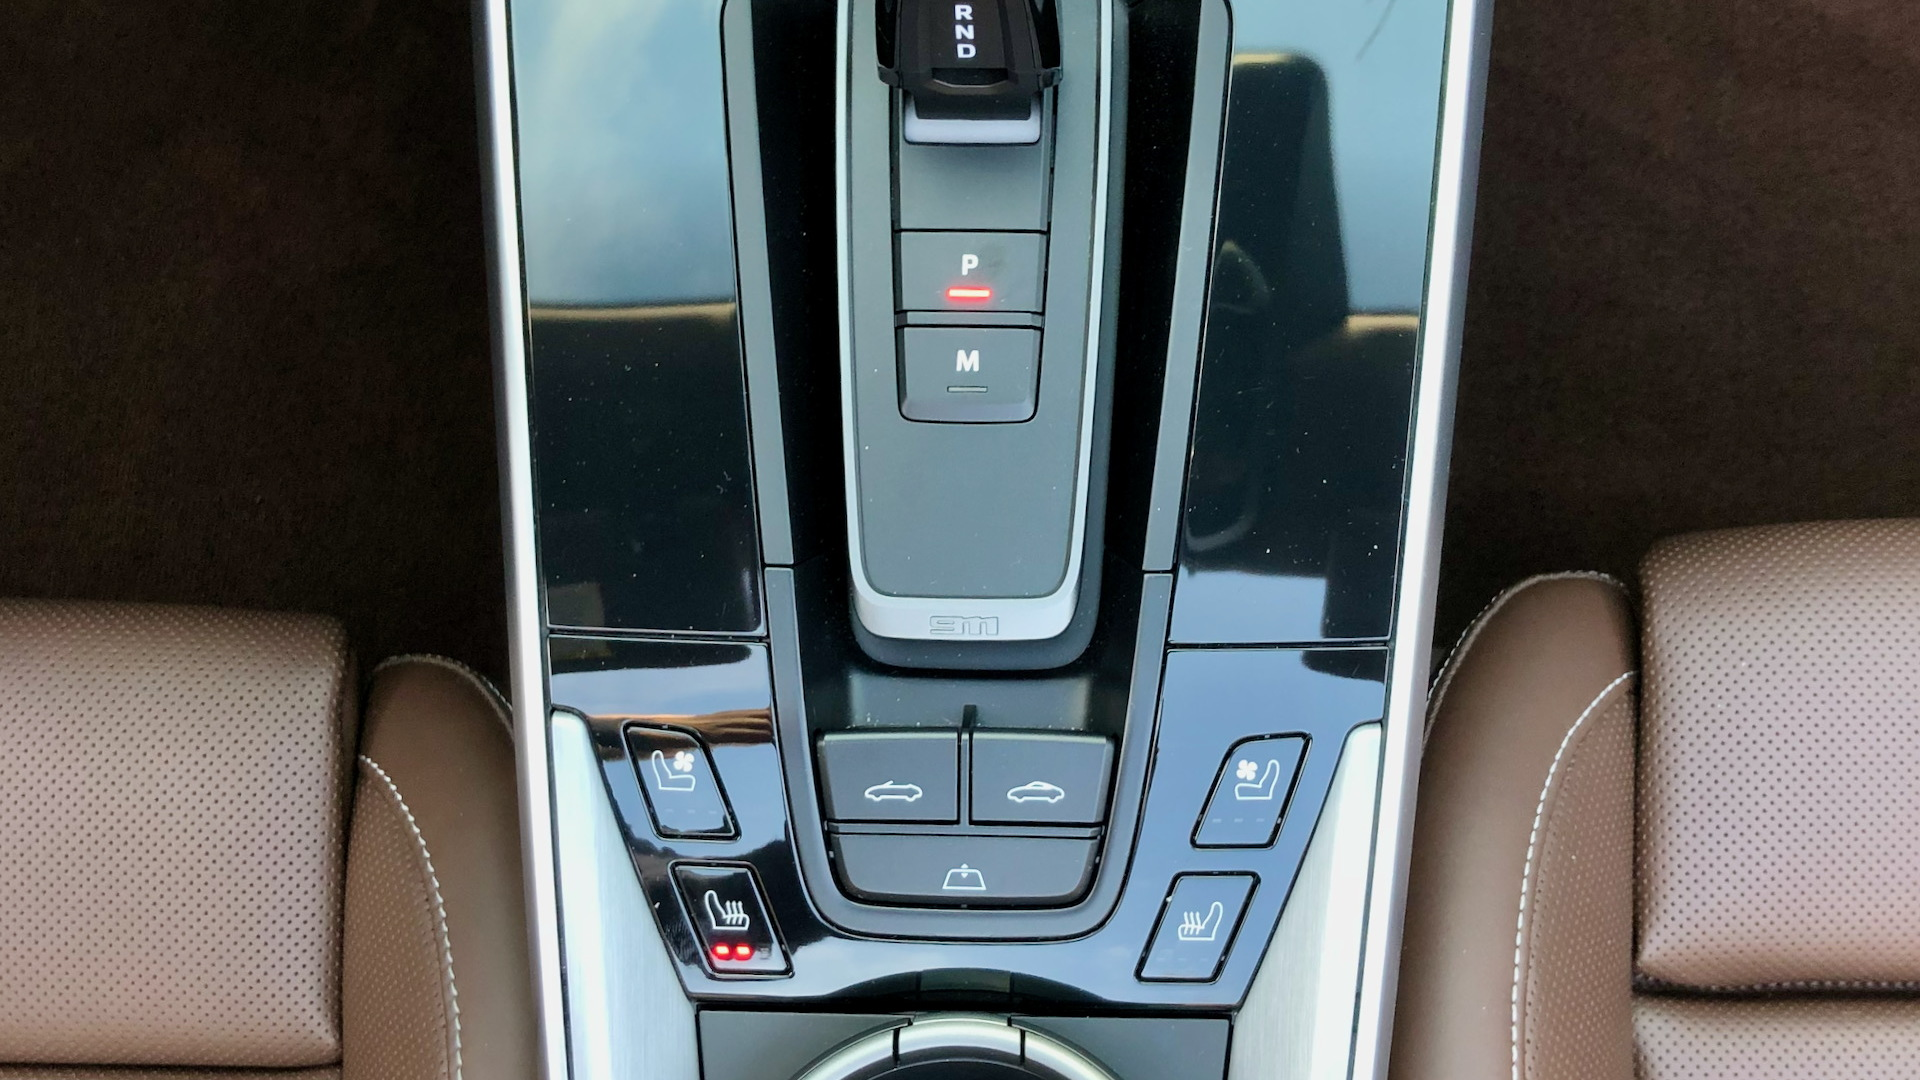 2021 Porsche 911 Turbo S Cabriolet review update